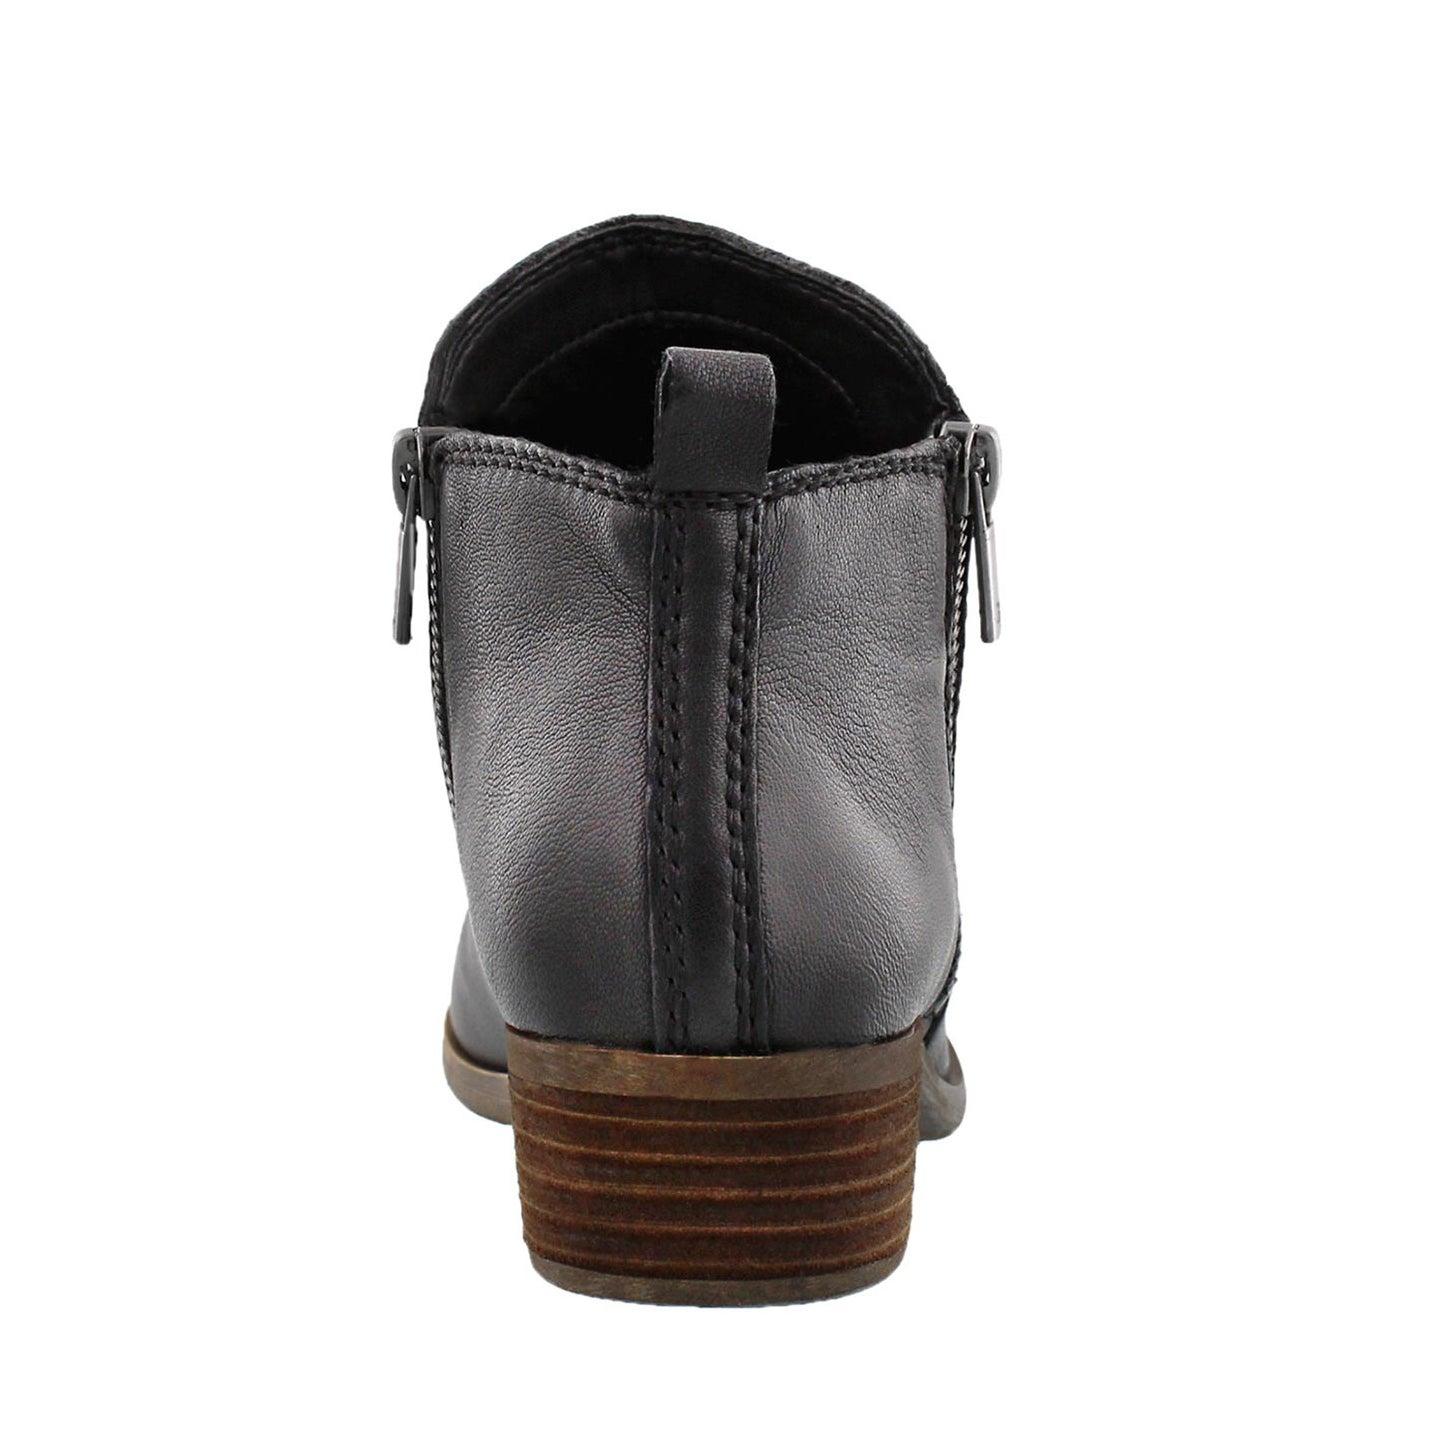 Lds Basel black zip up casual bootie